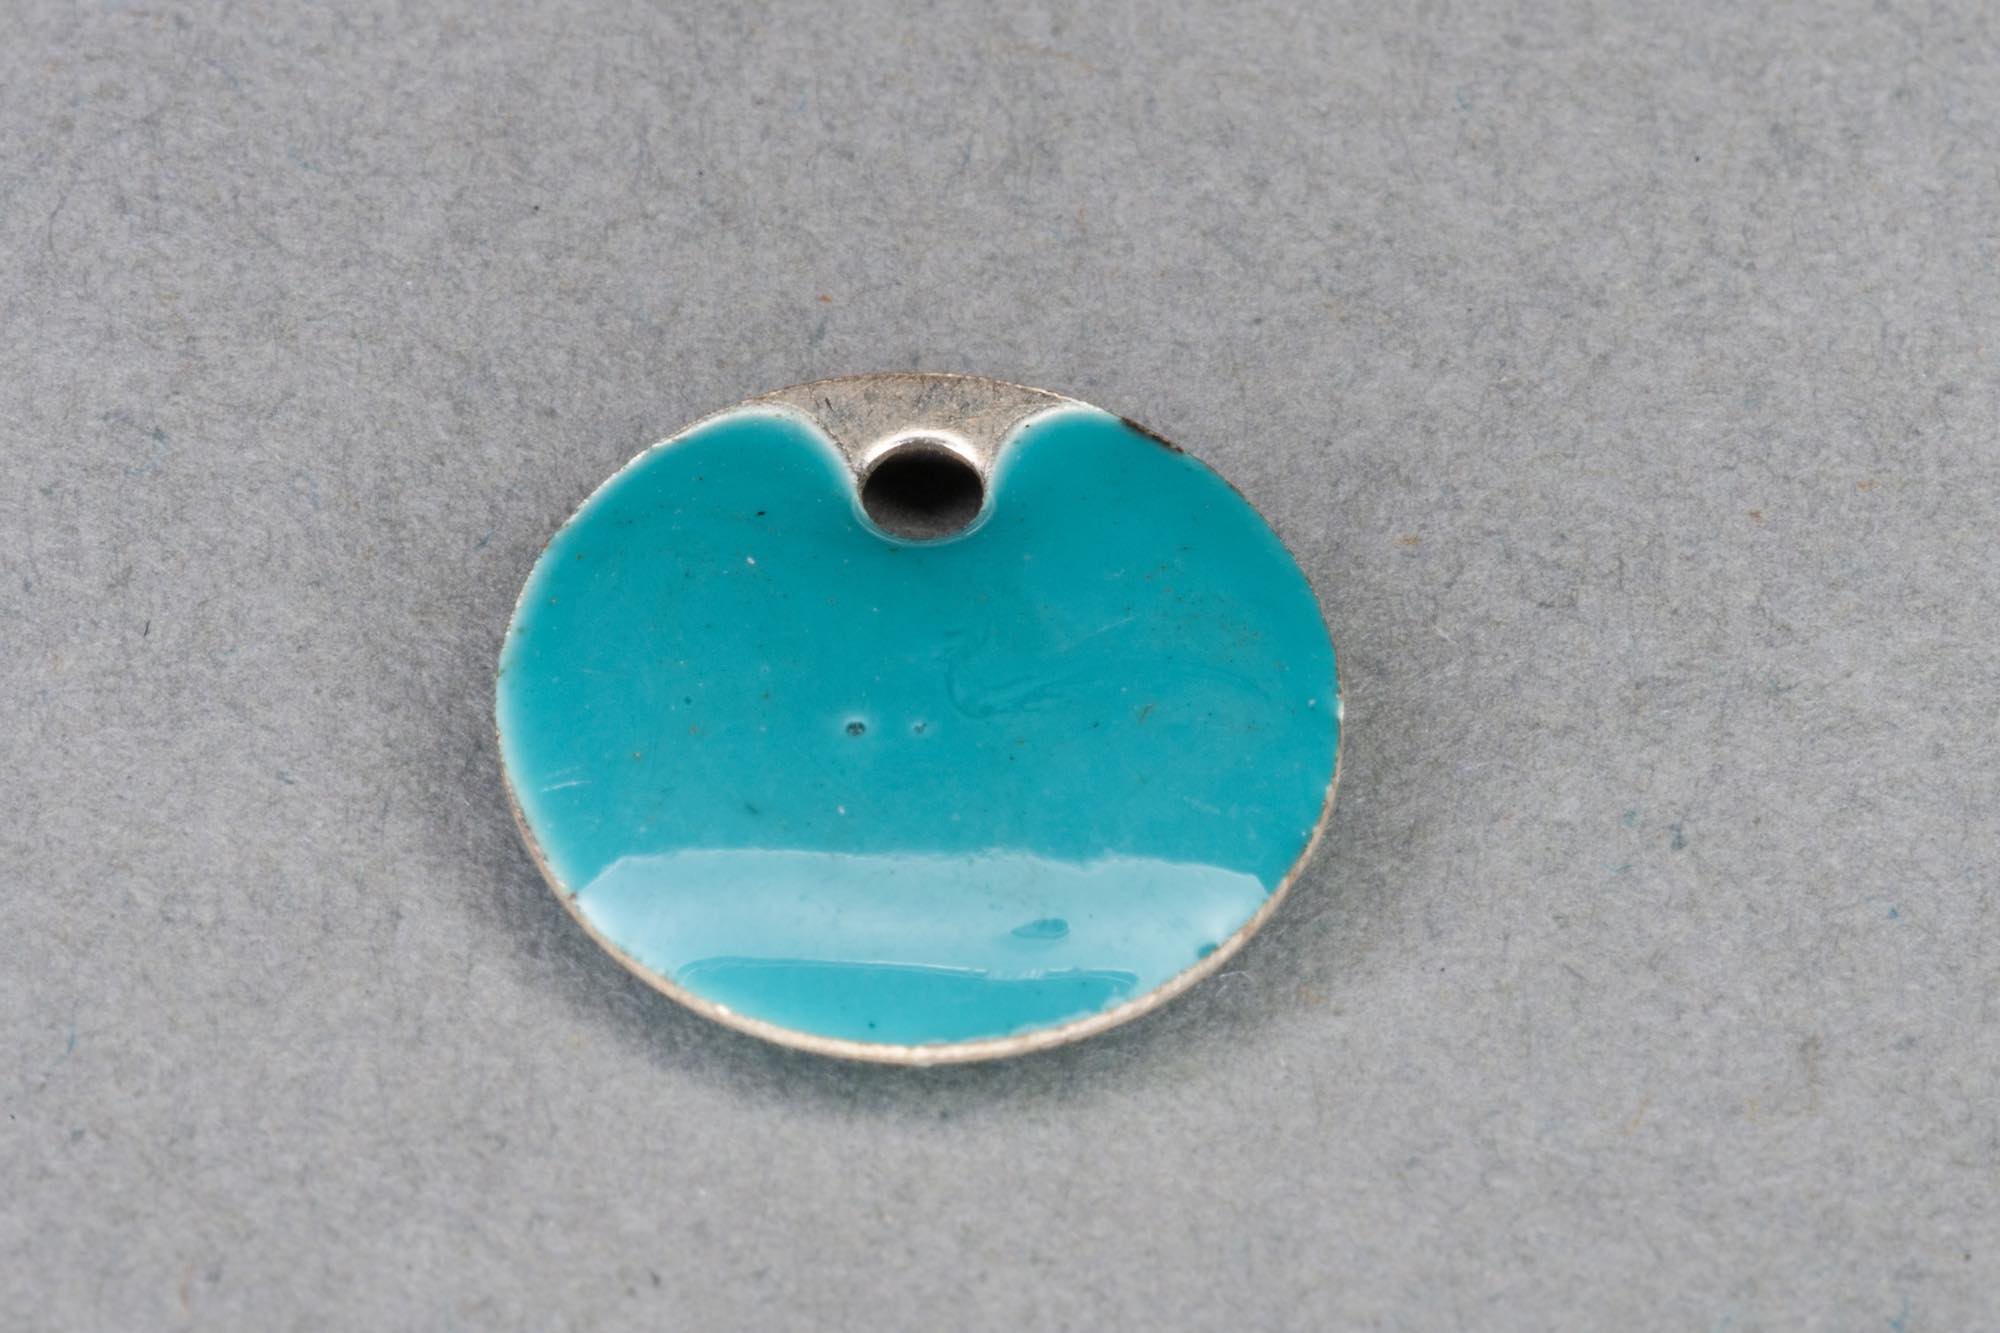 Flat Turquoise Enamel Disk Pendant, Silver Edge 12x2mm, 1.2mm hole